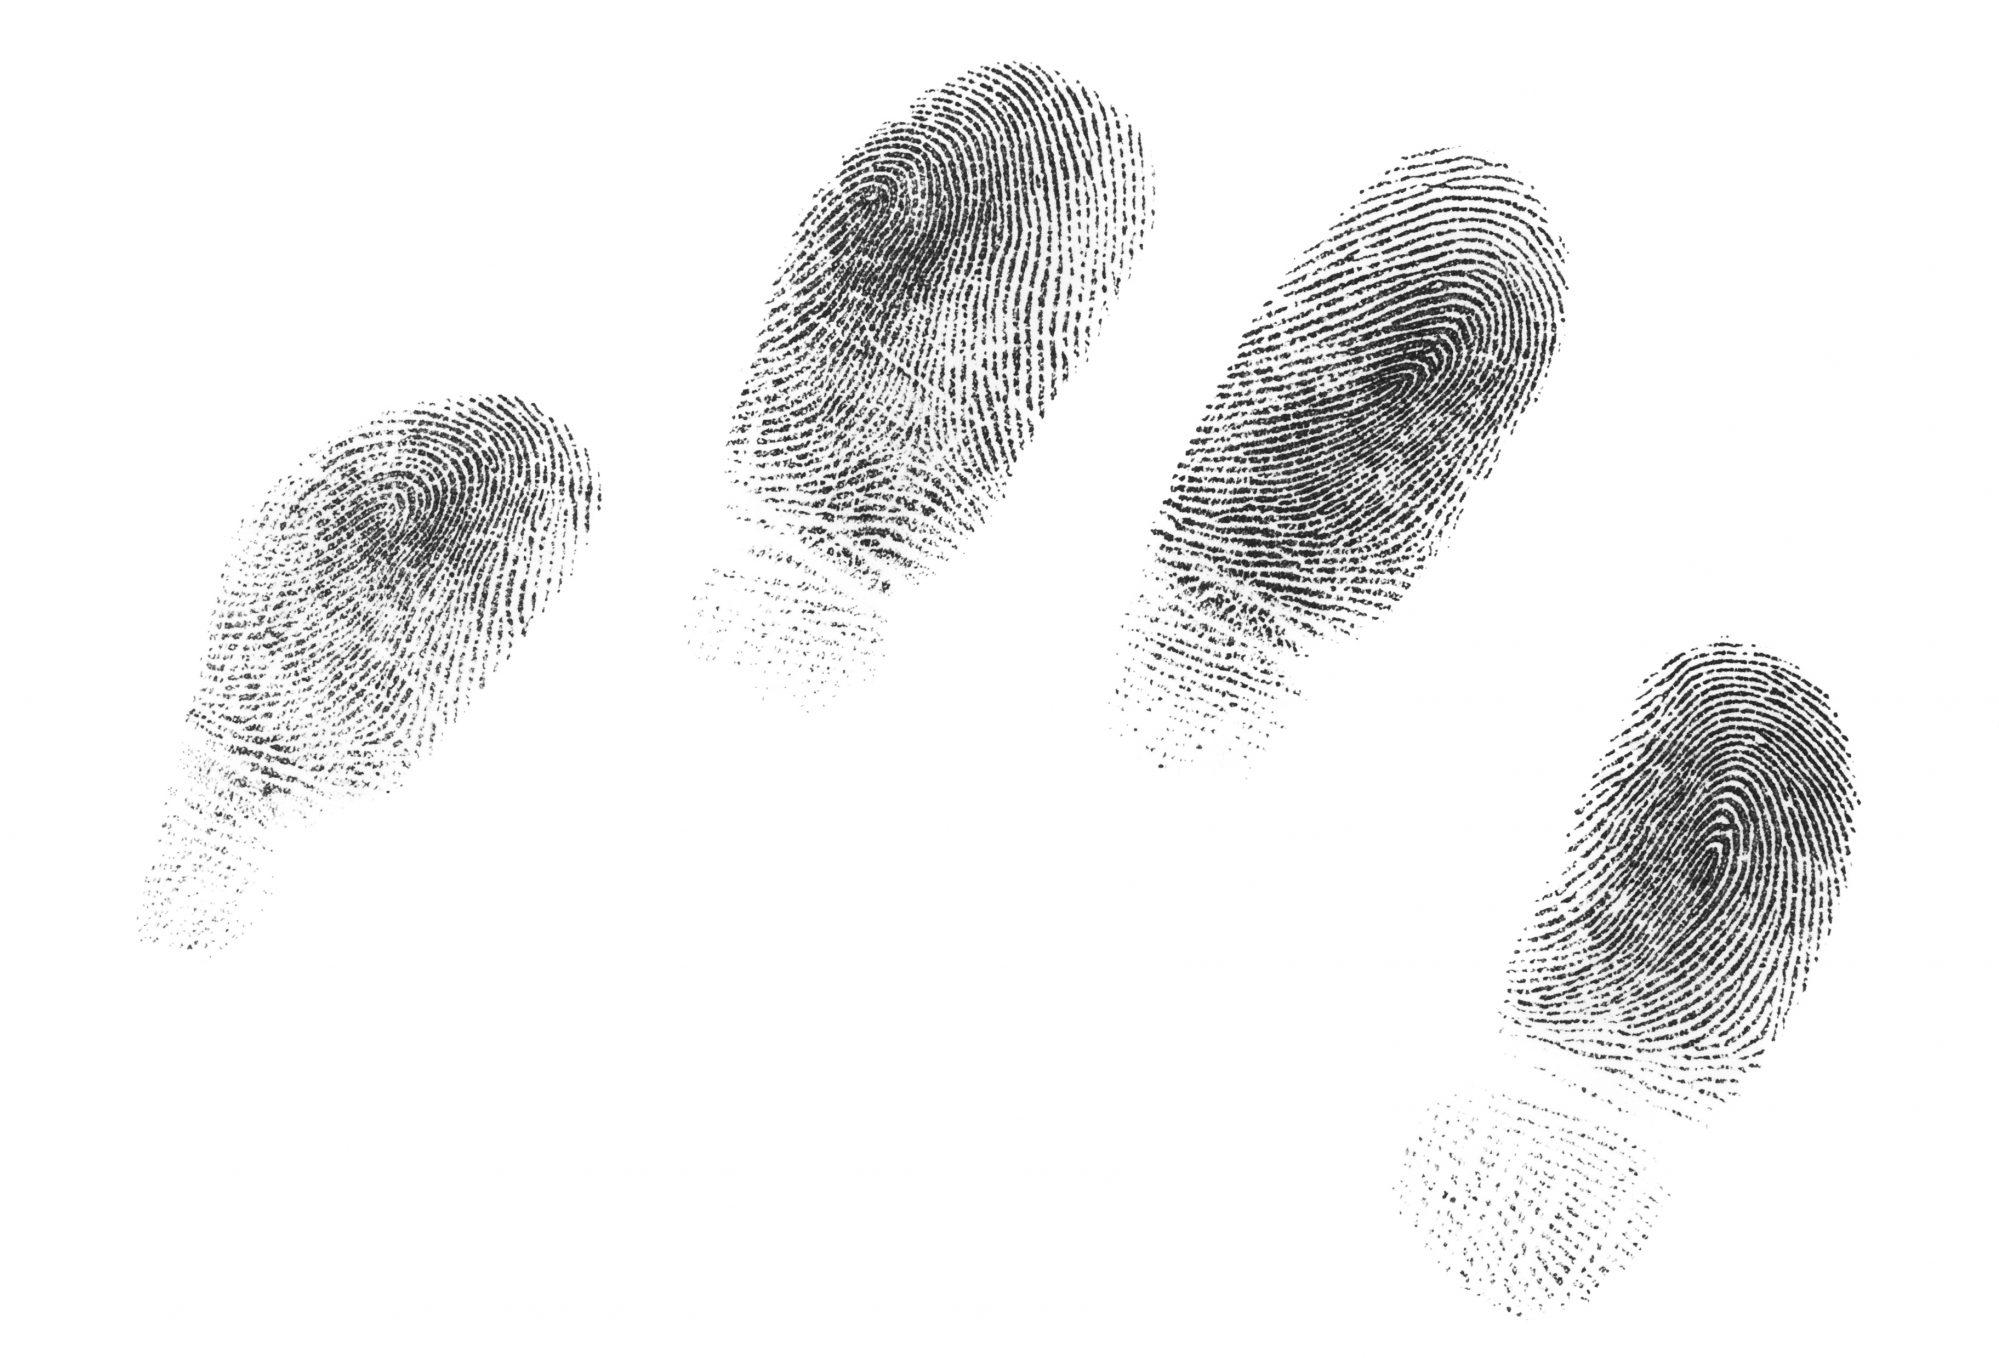 Fingerprint Identification Printed Digital Forensic Assurance